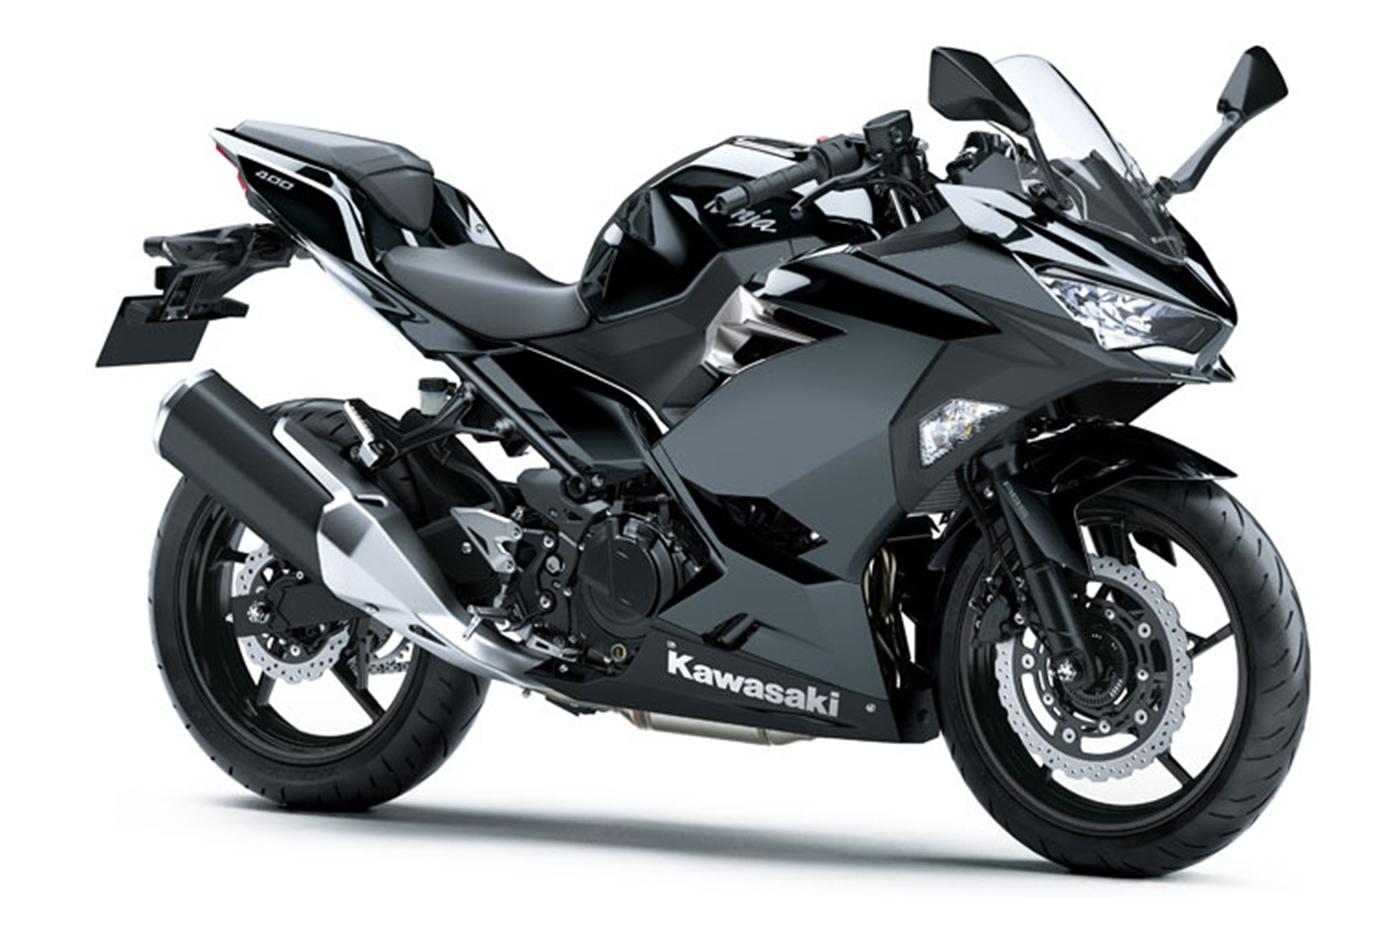 kawasaki-ninja-400-2018-4.jpg